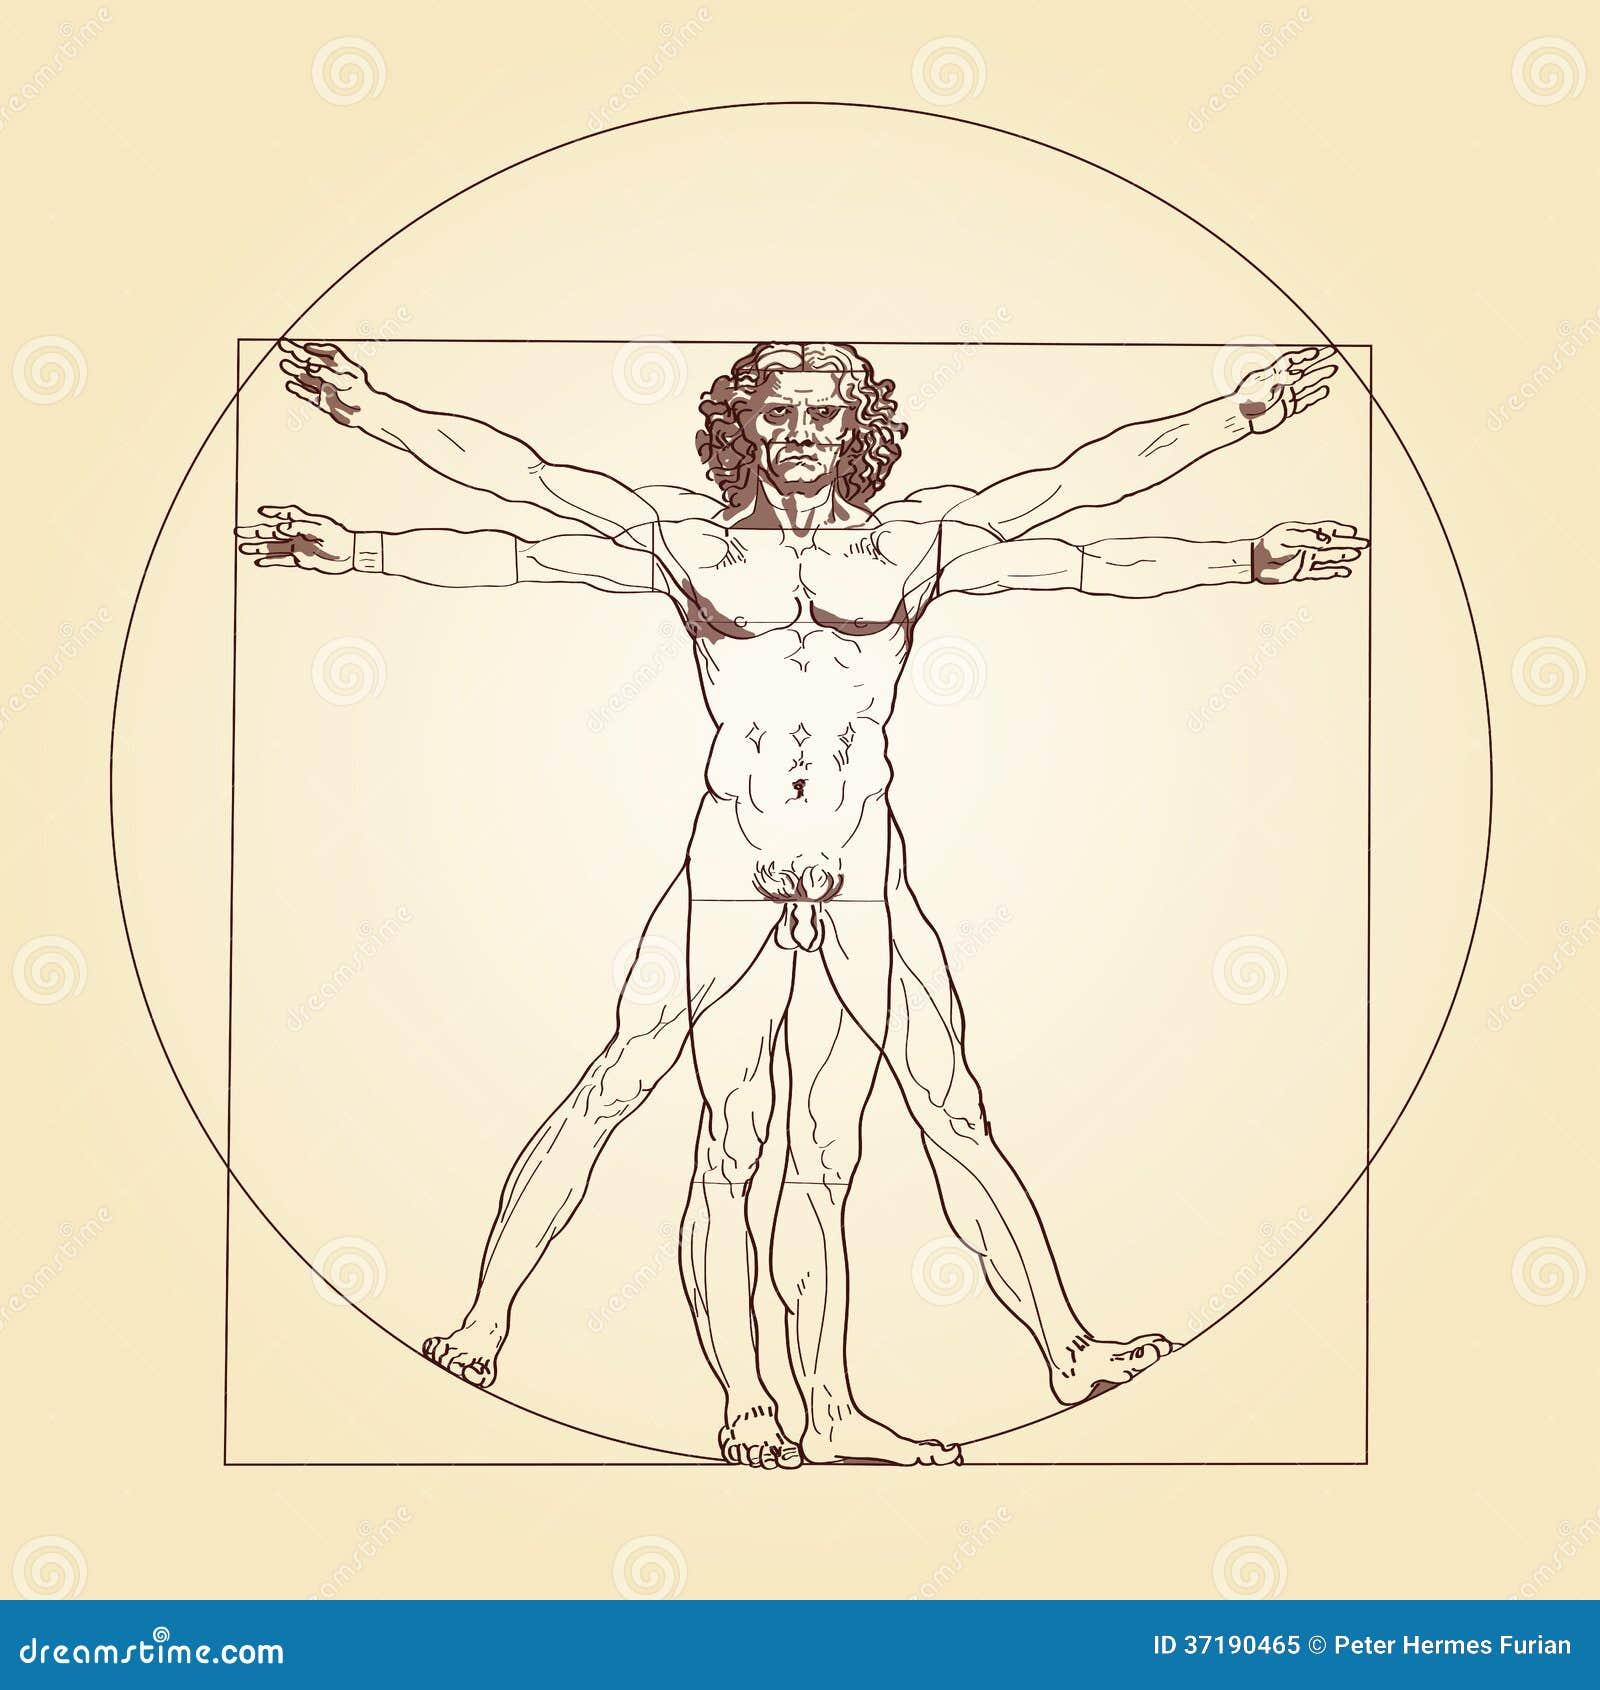 Anaplastic Large Cell Lymphoma Hallmark Cell Vitruvian Man And Woma...